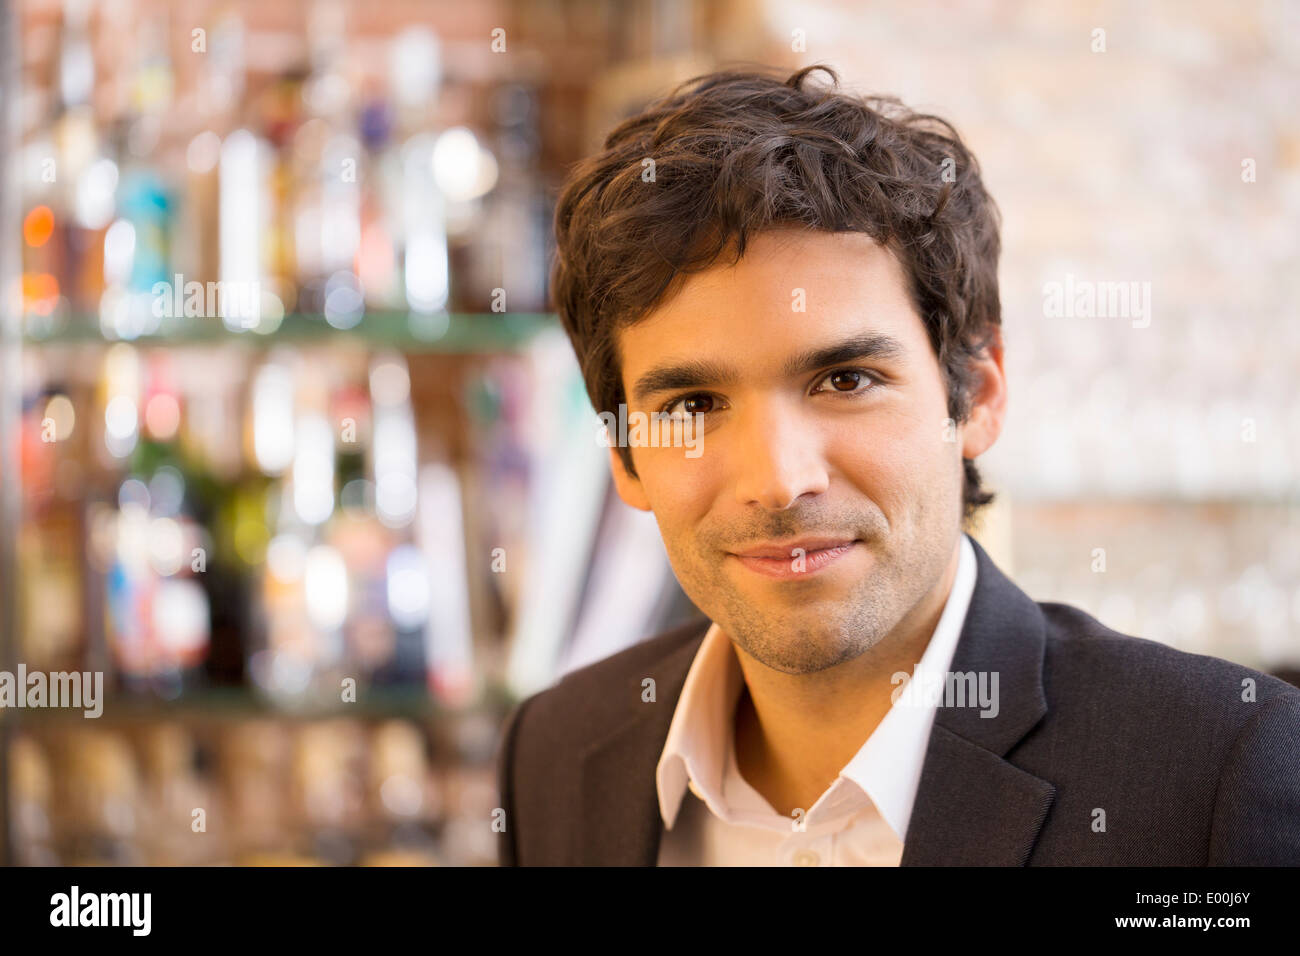 Male cheerful looking camera coffee bar - Stock Image